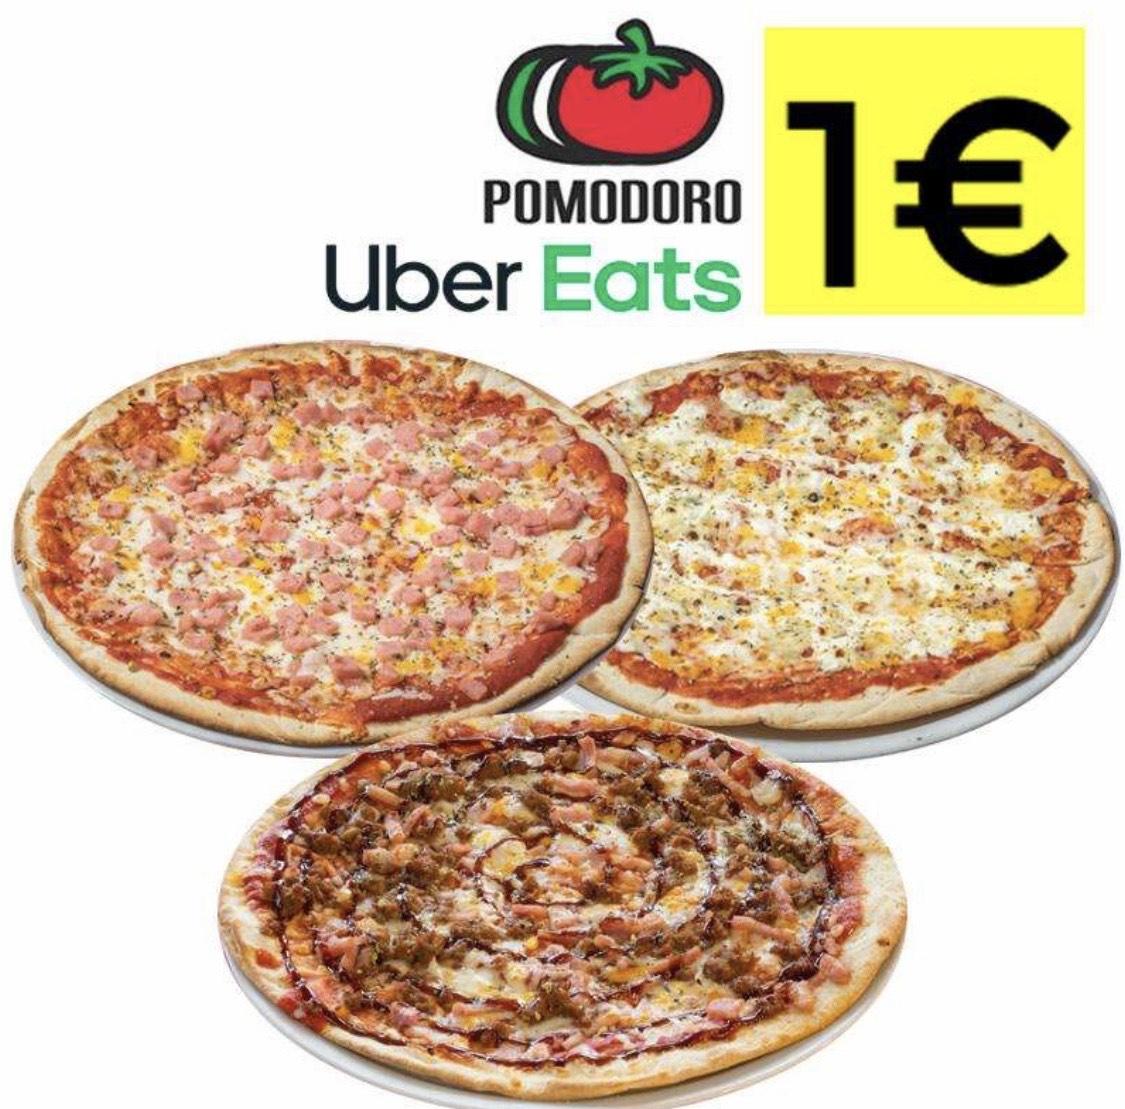 Pizzas Pomodoro A 1€